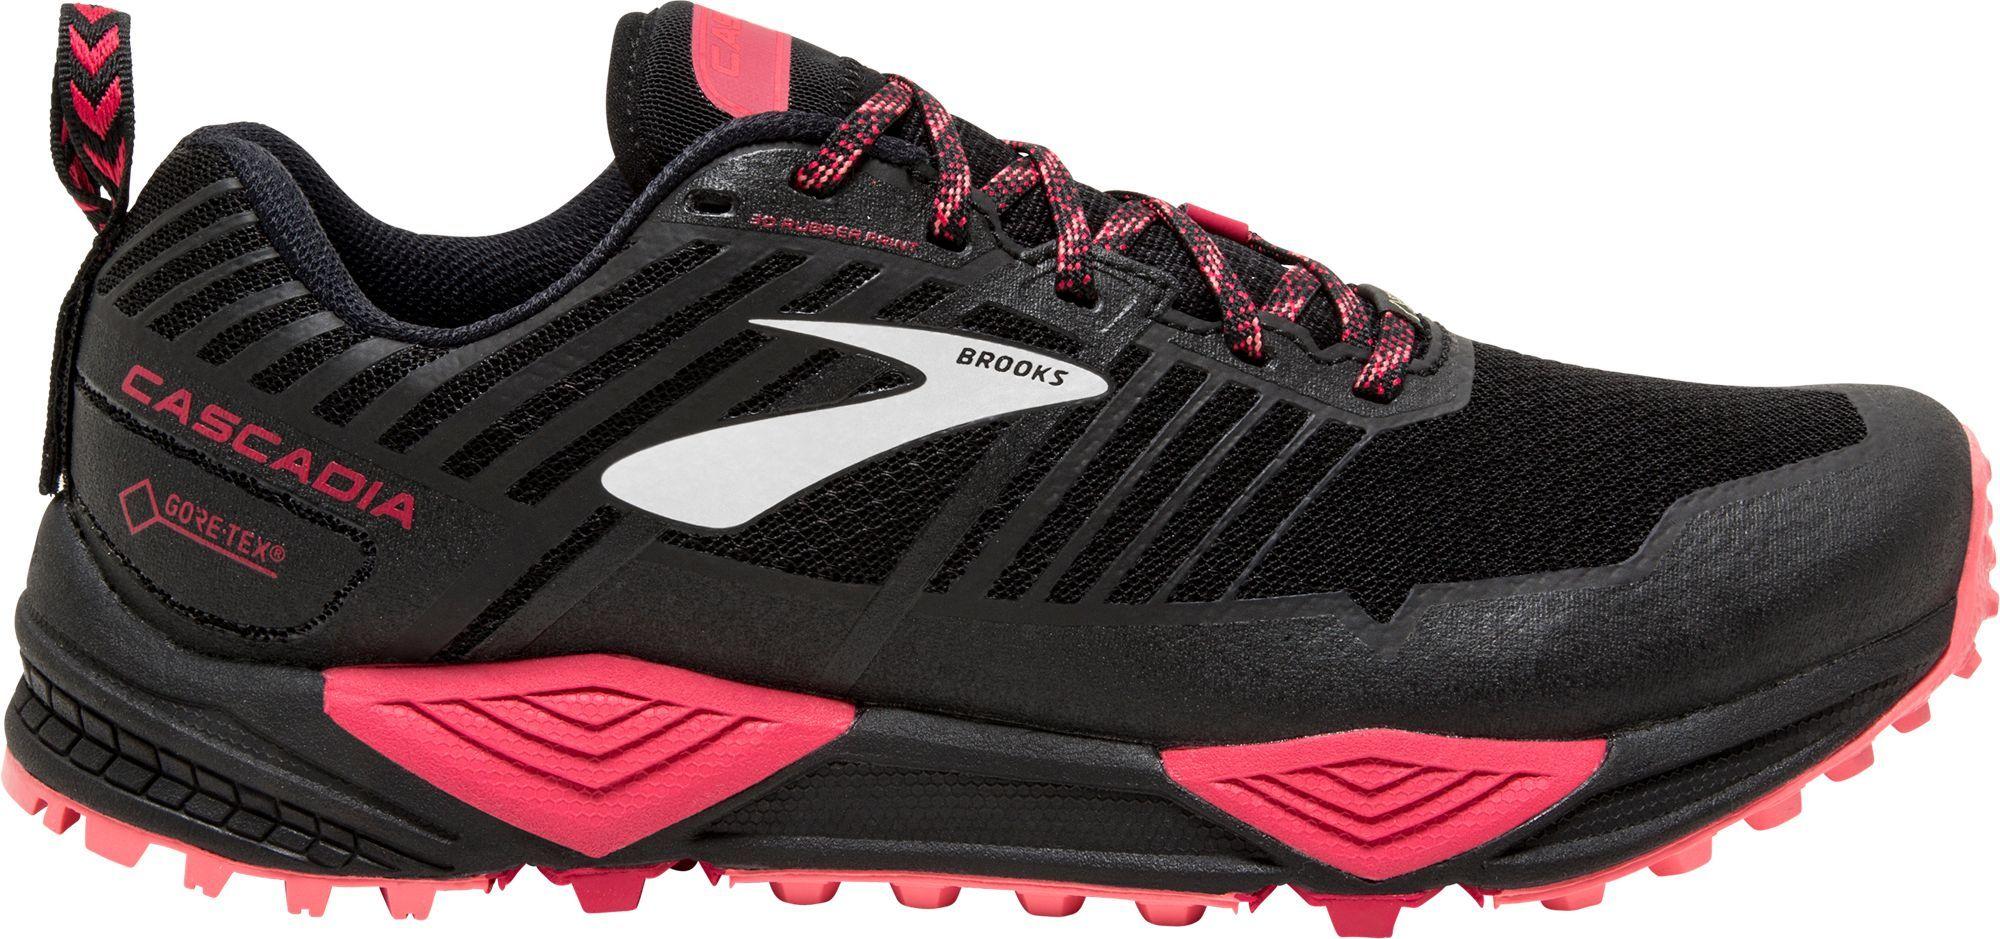 bbc81816070 Brooks Women s Cascadia 13 GTX Trail Running Shoes